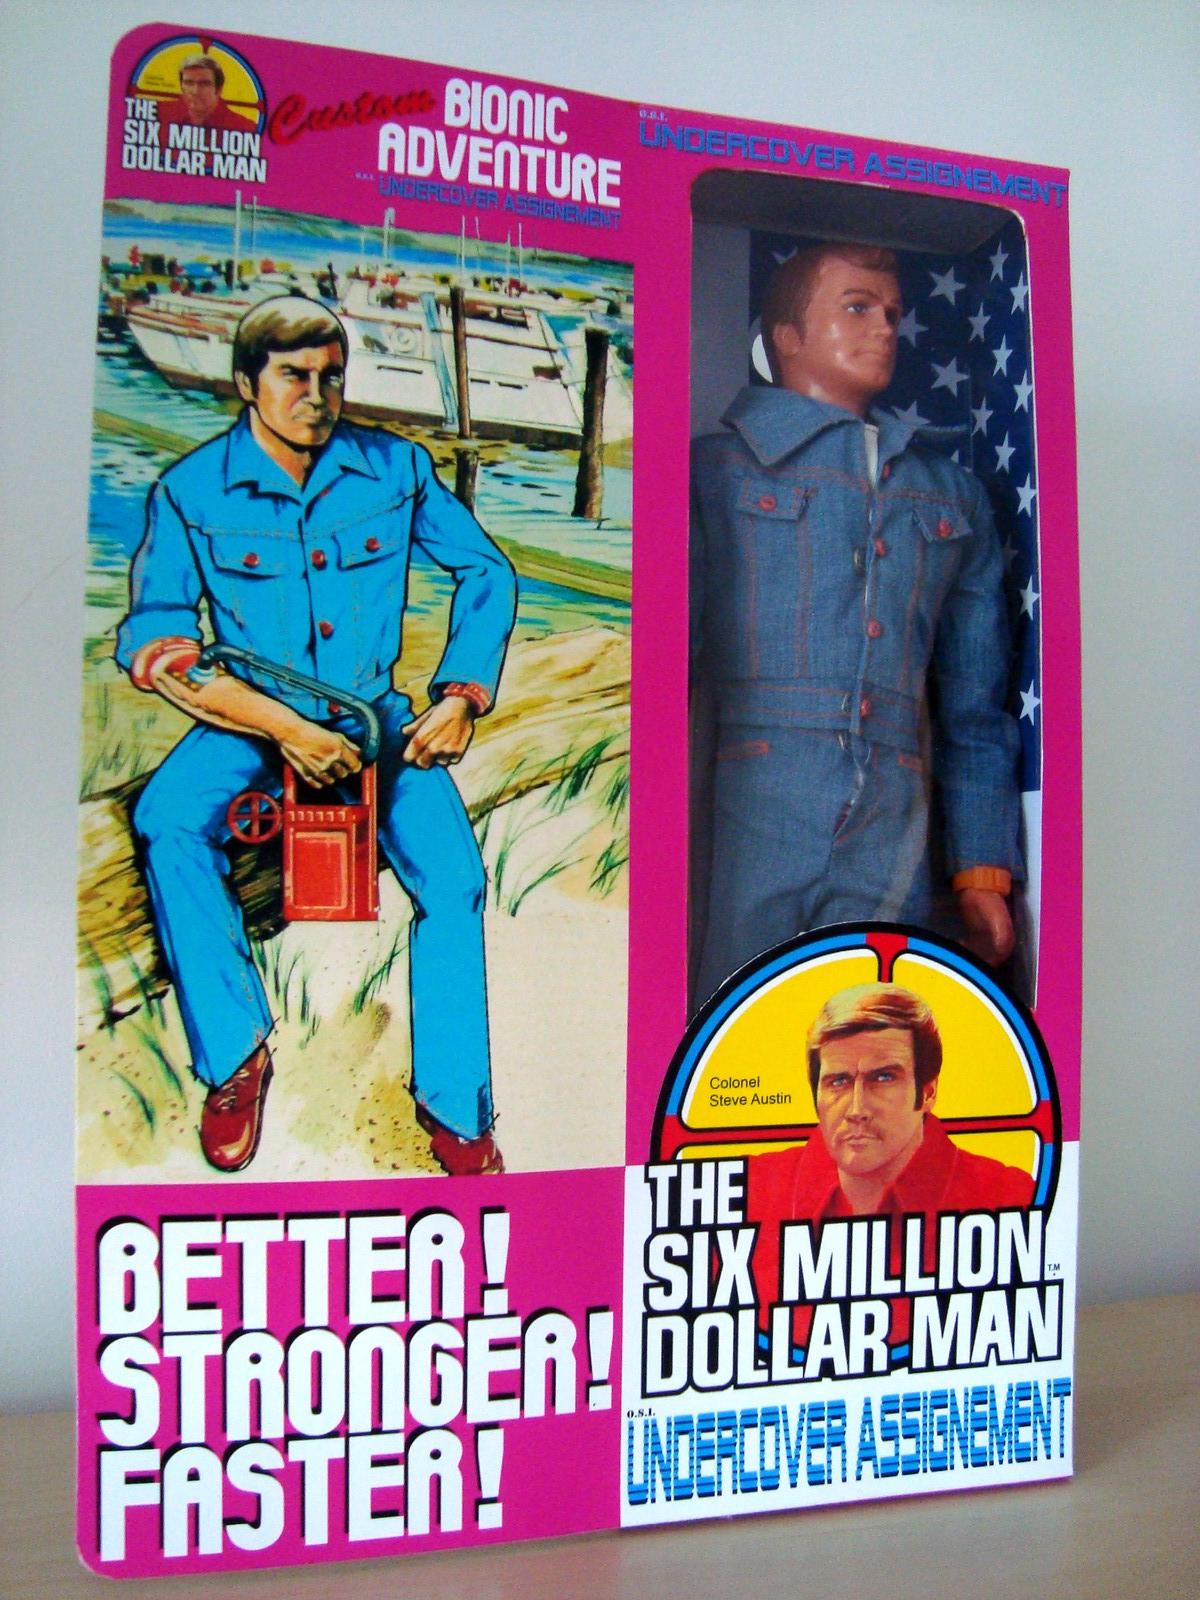 Steve Austin L'homme qui valait 3 milliards - KENNER MECCANO - Page 11 170629071253495866